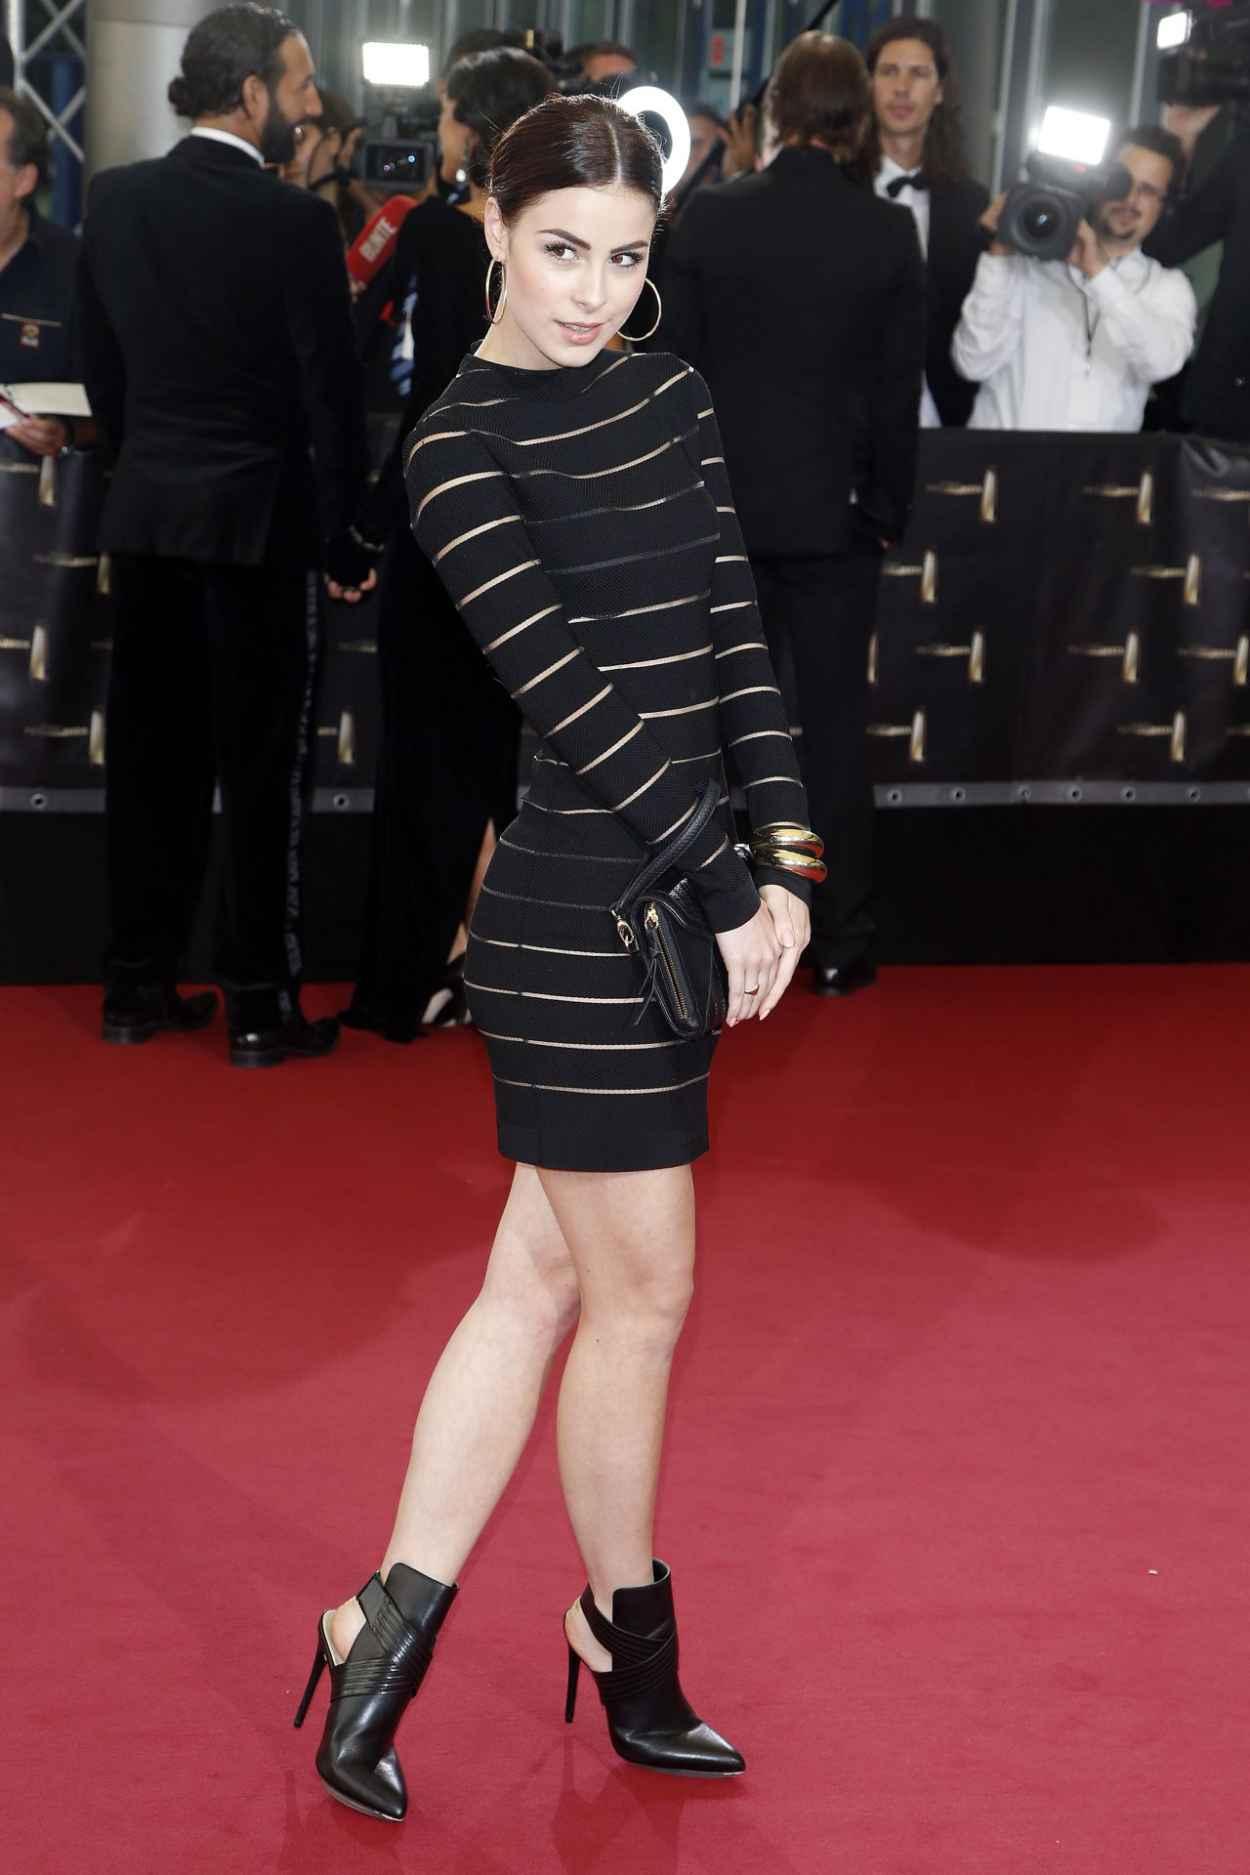 Lena Meyer-Landrut - 16th Deutscher Fernsehpreis 2015 in Cologne (Germany)-1